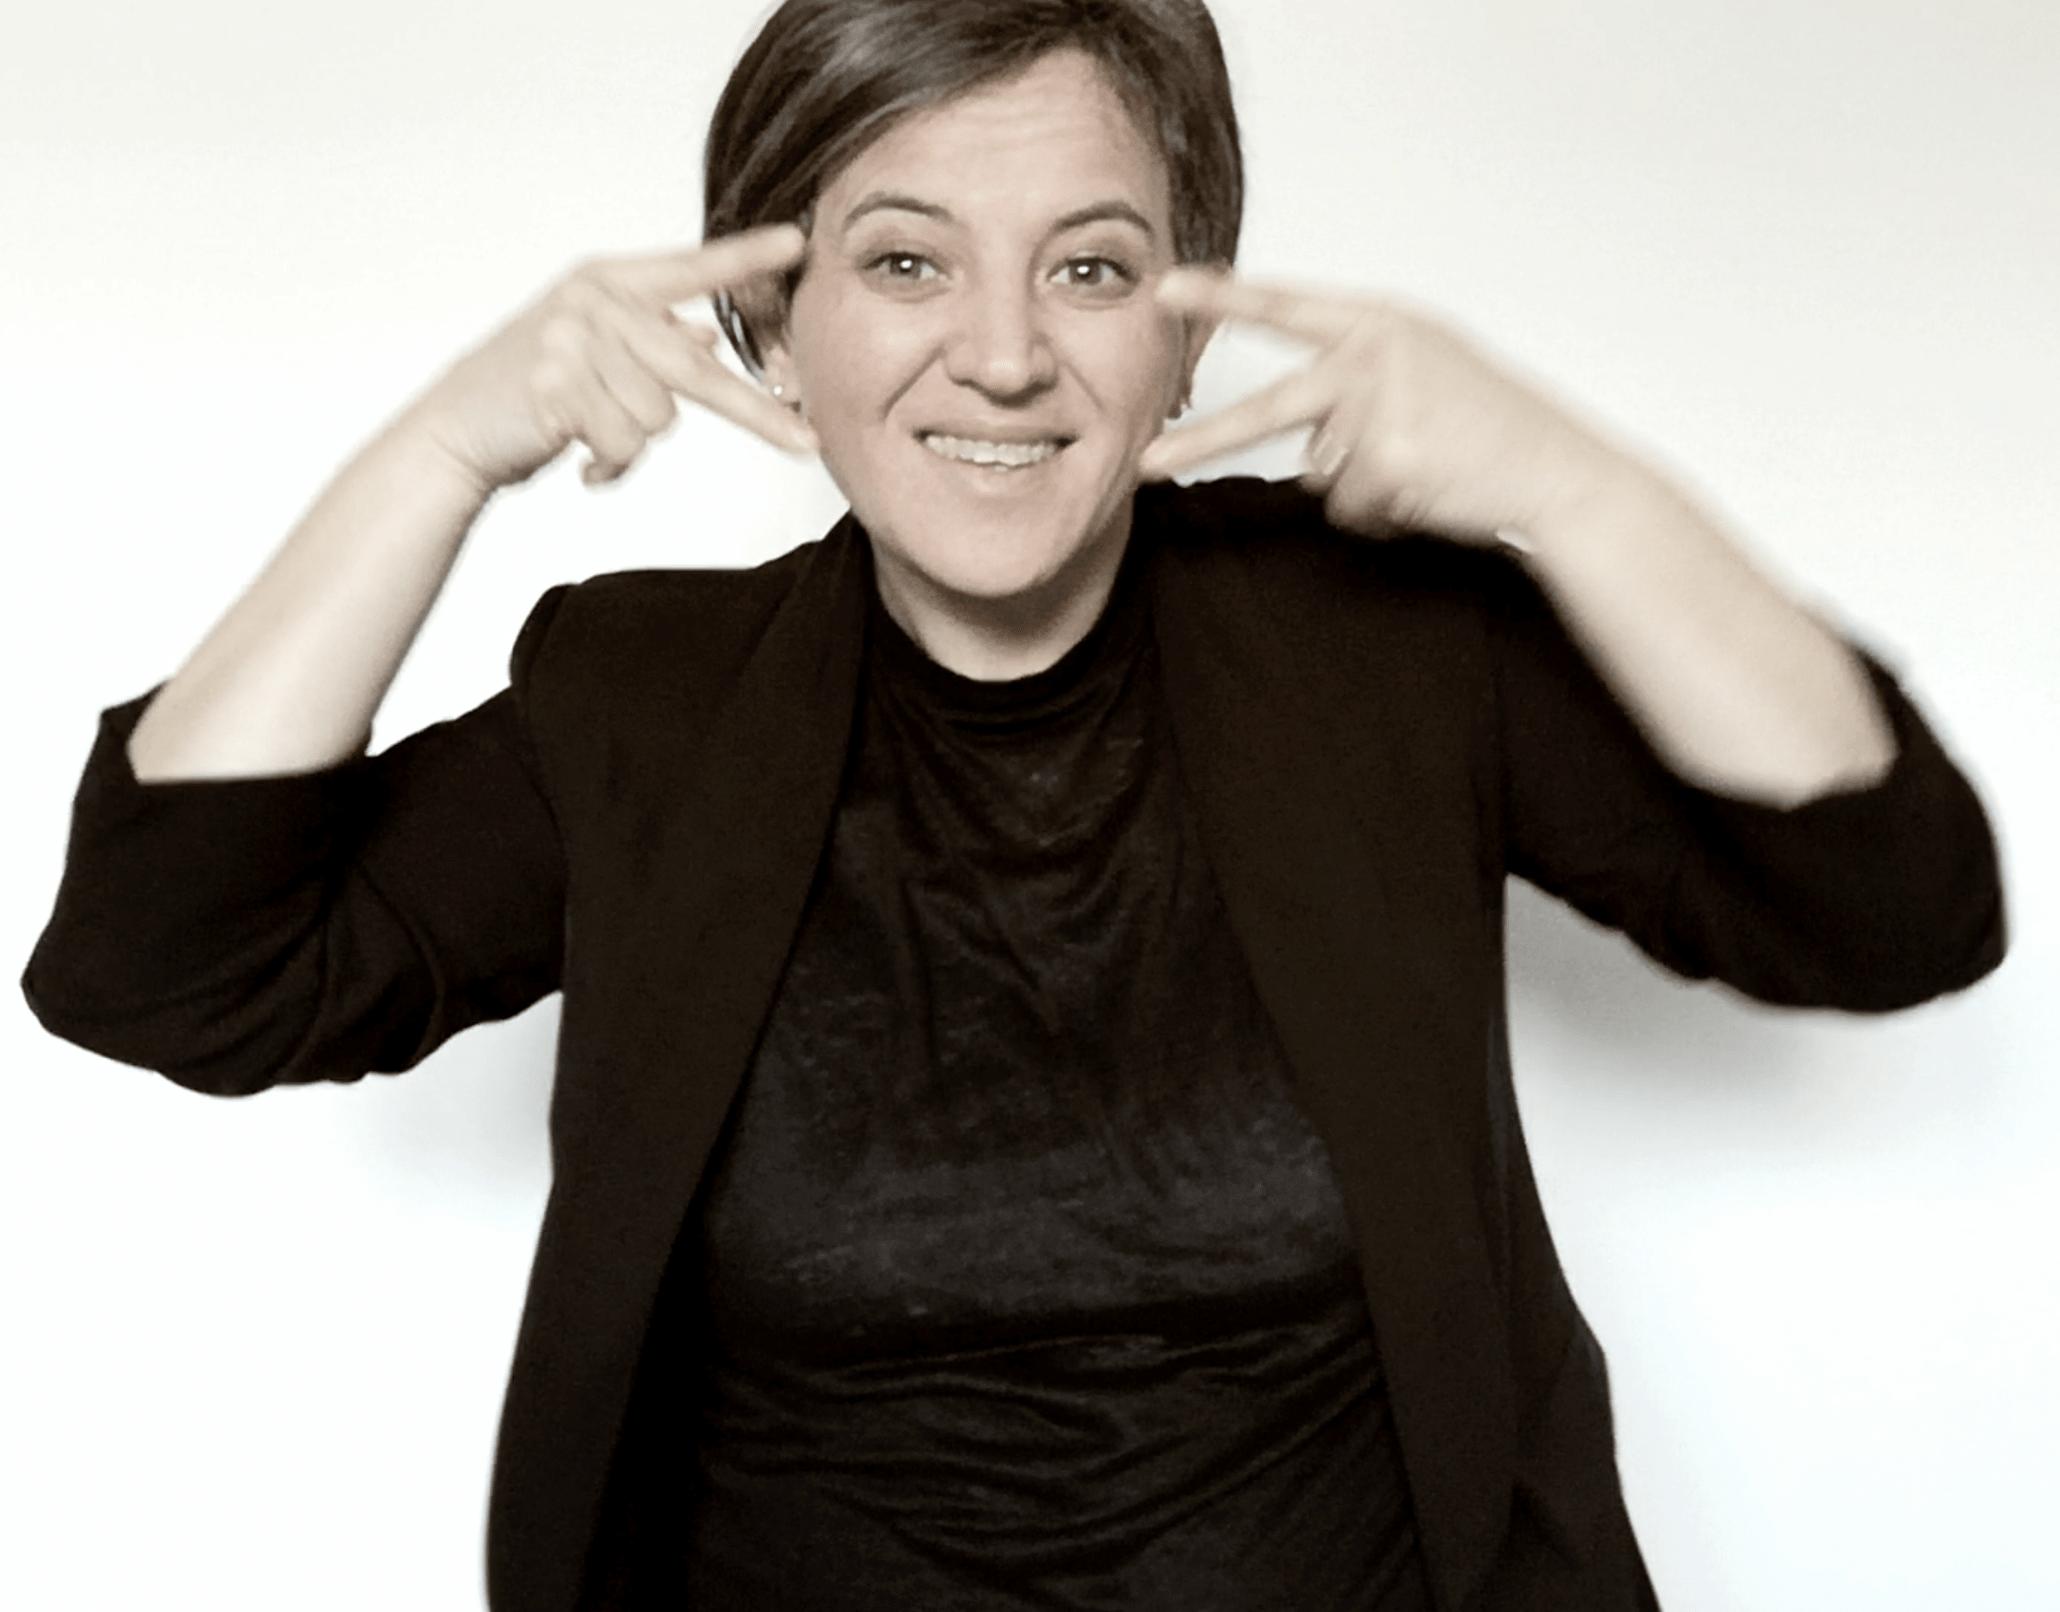 Antonella Iasso